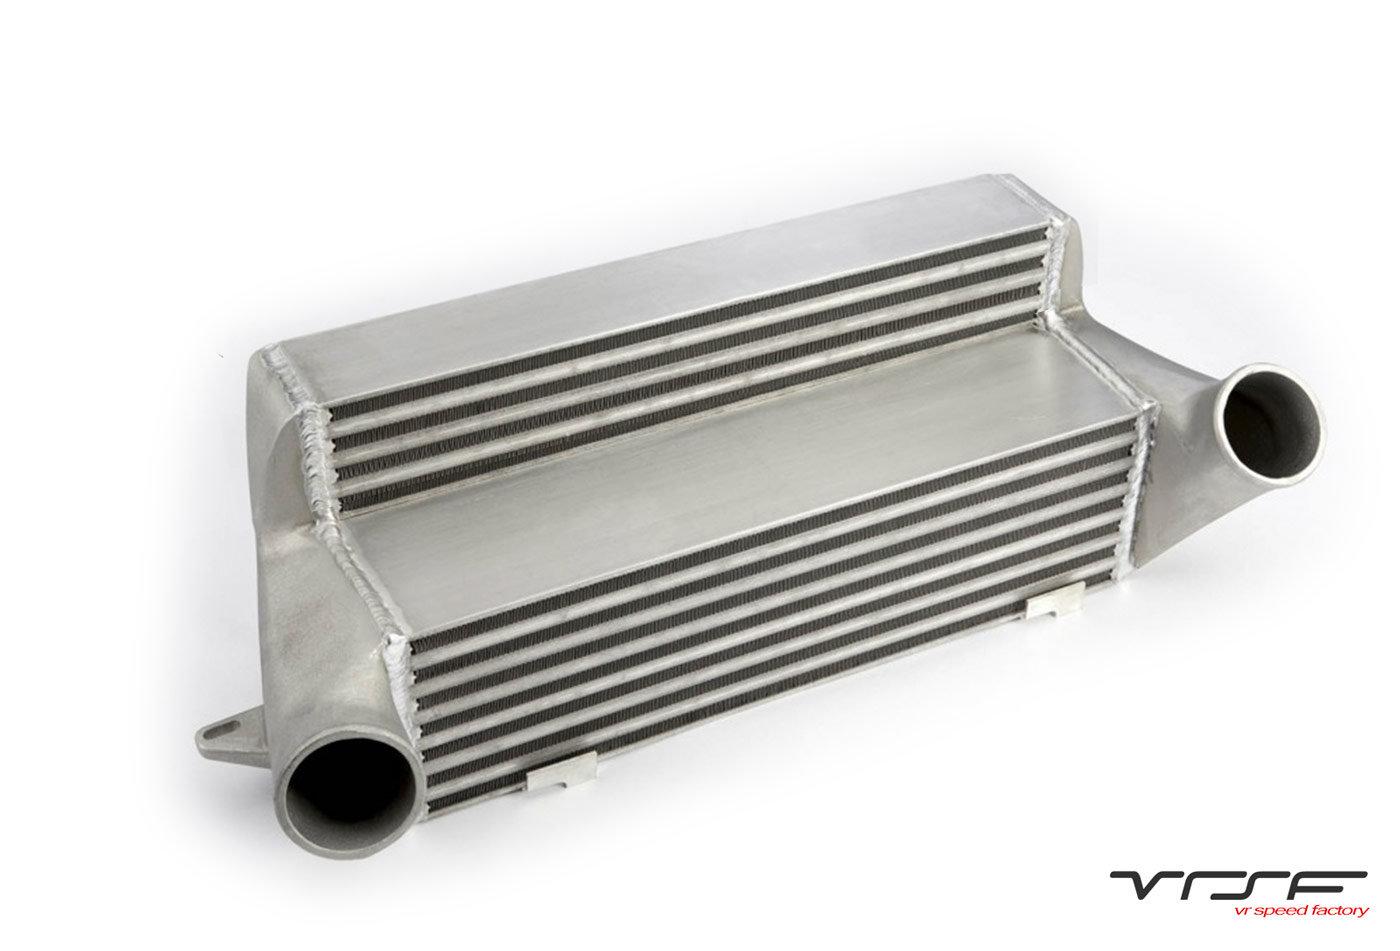 VRSF Performance HD Intercooler FMIC Upgrade Kit 07-12 135i/335i/X1 N54 &  N55 E82/E84/E90/E92 - VR Speed Factory